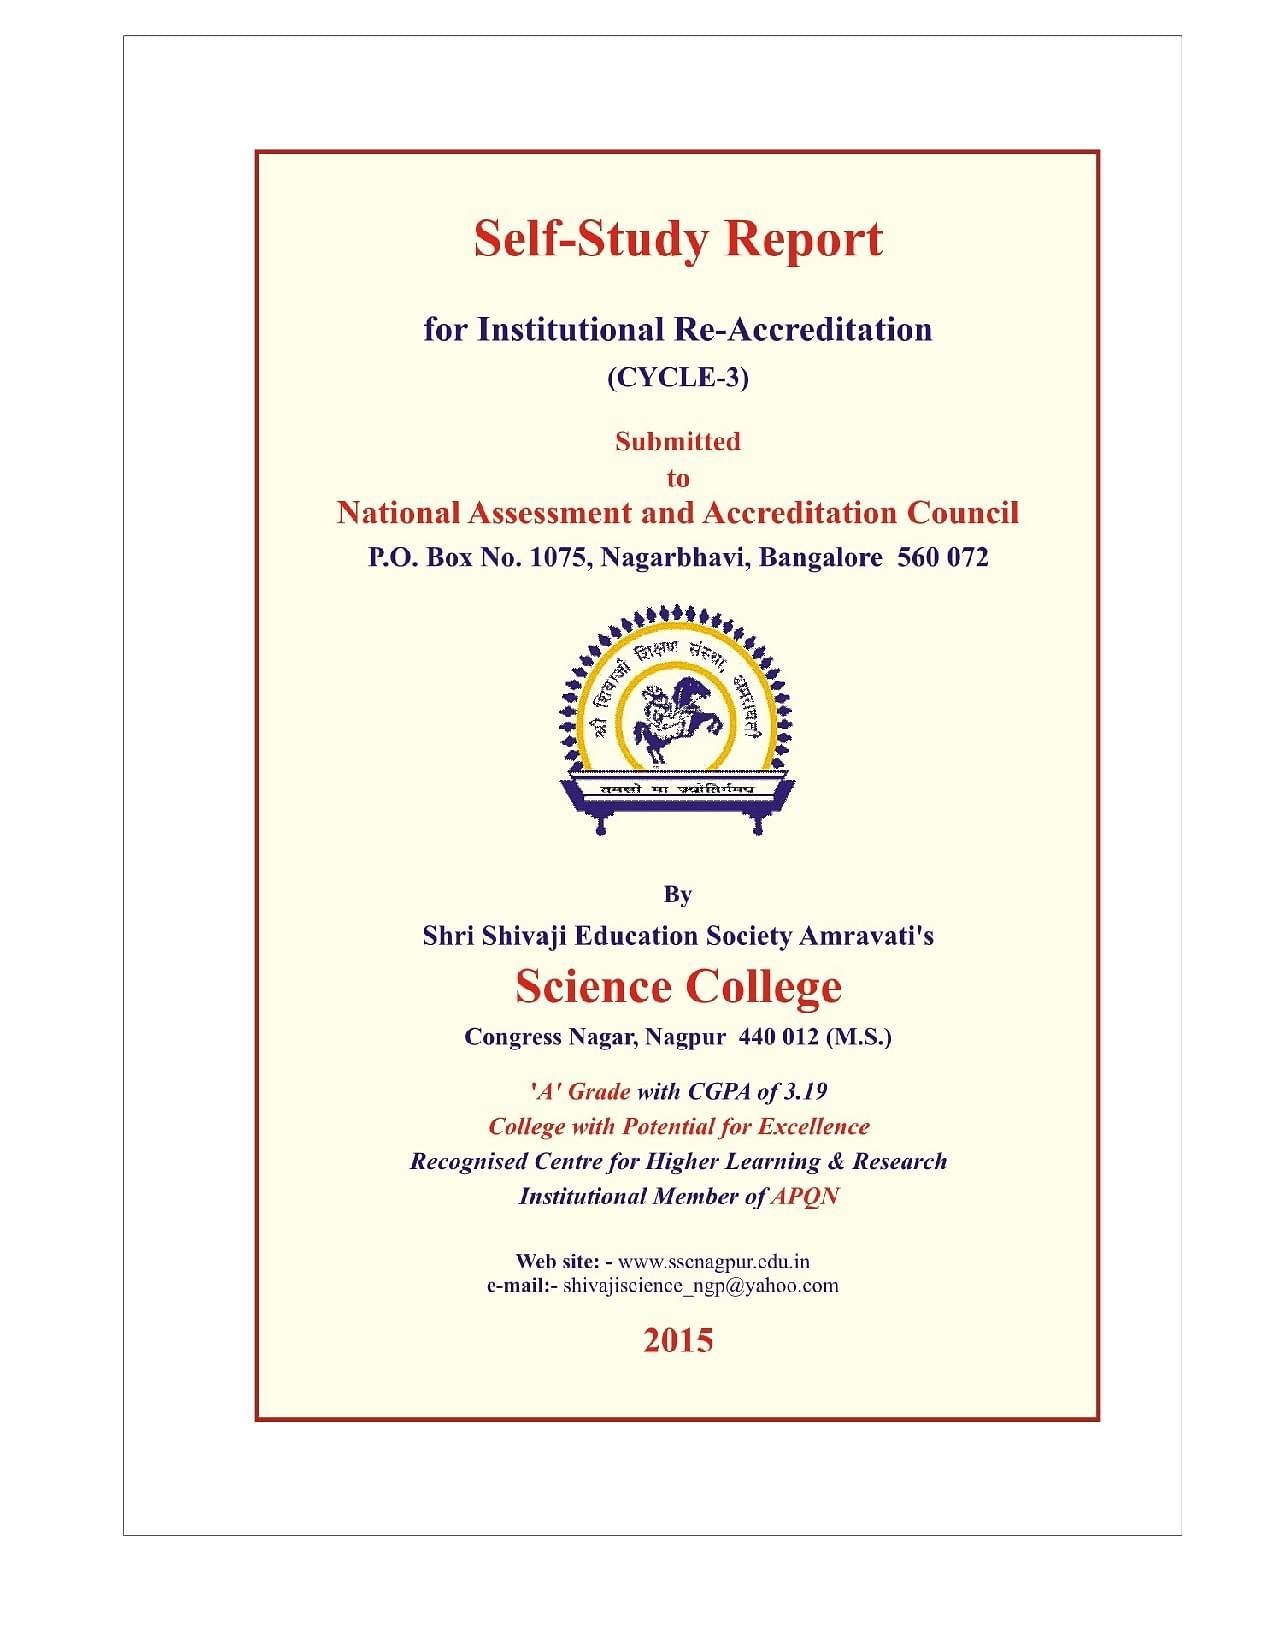 Shivaji science college nagpur tinder dating site